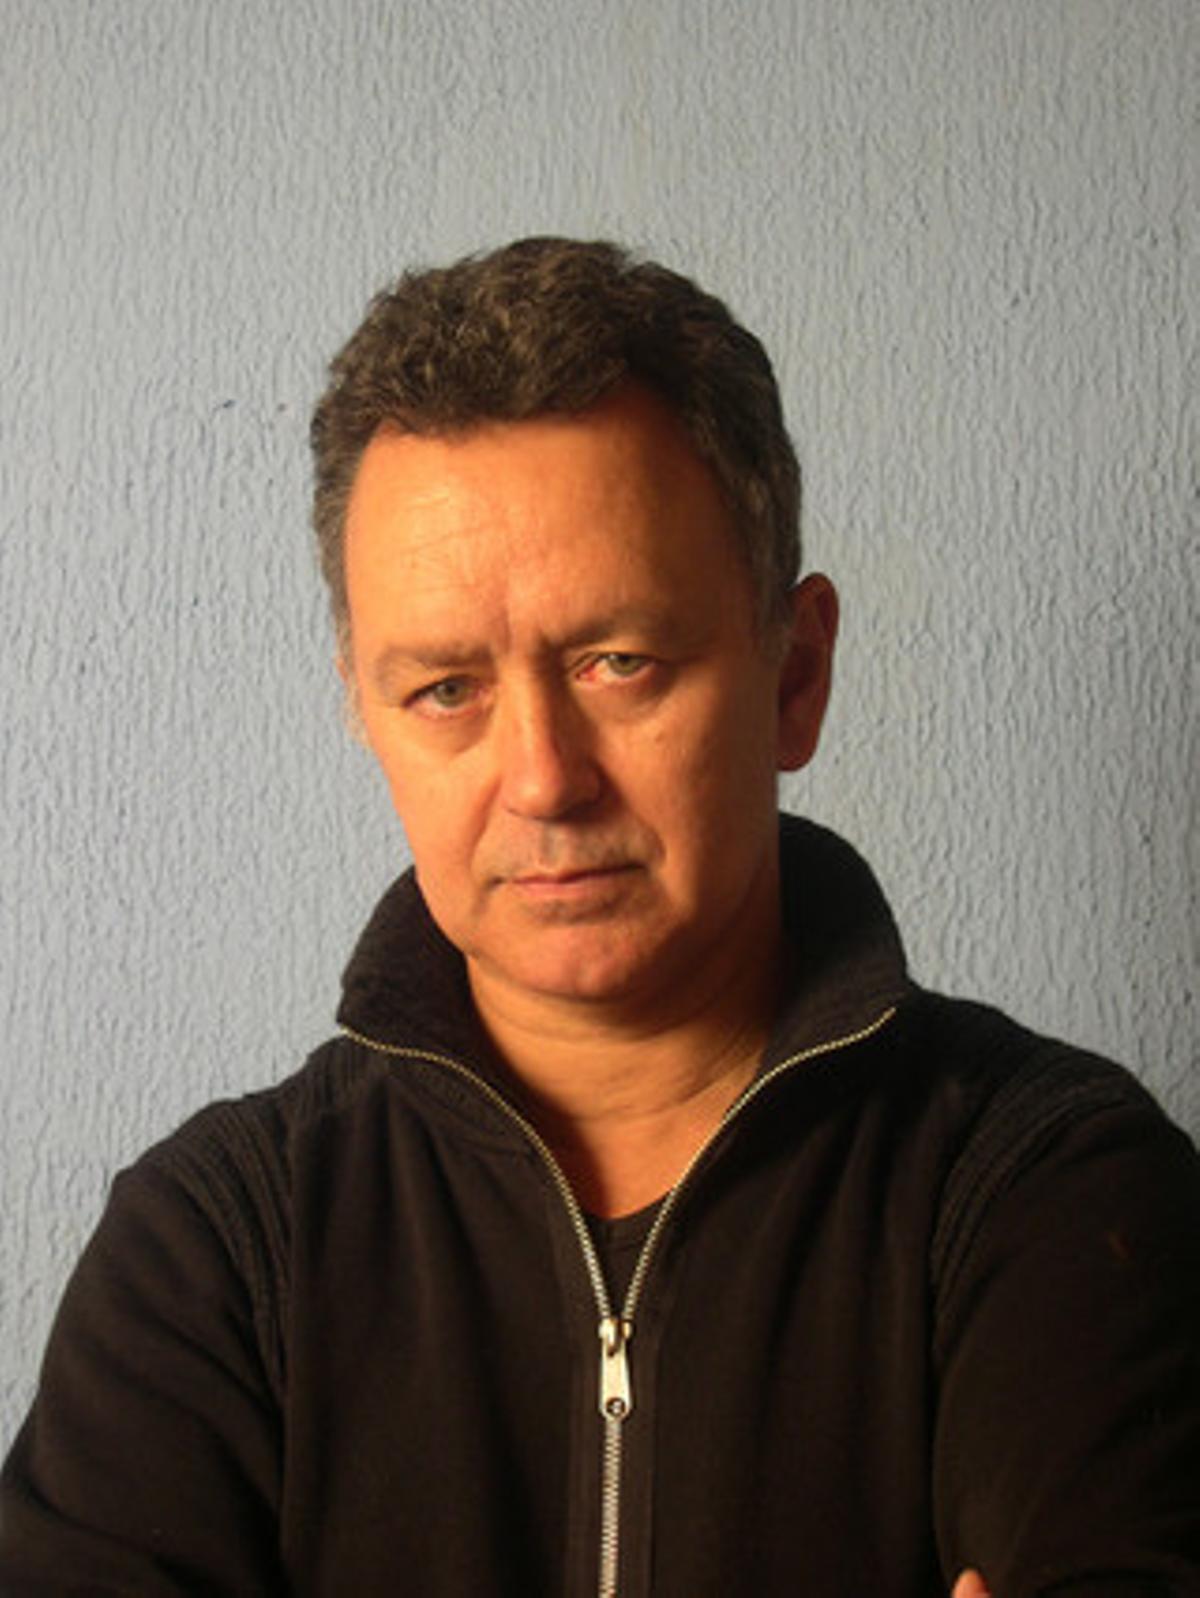 Paco Elvira, en una imagen del 2008.